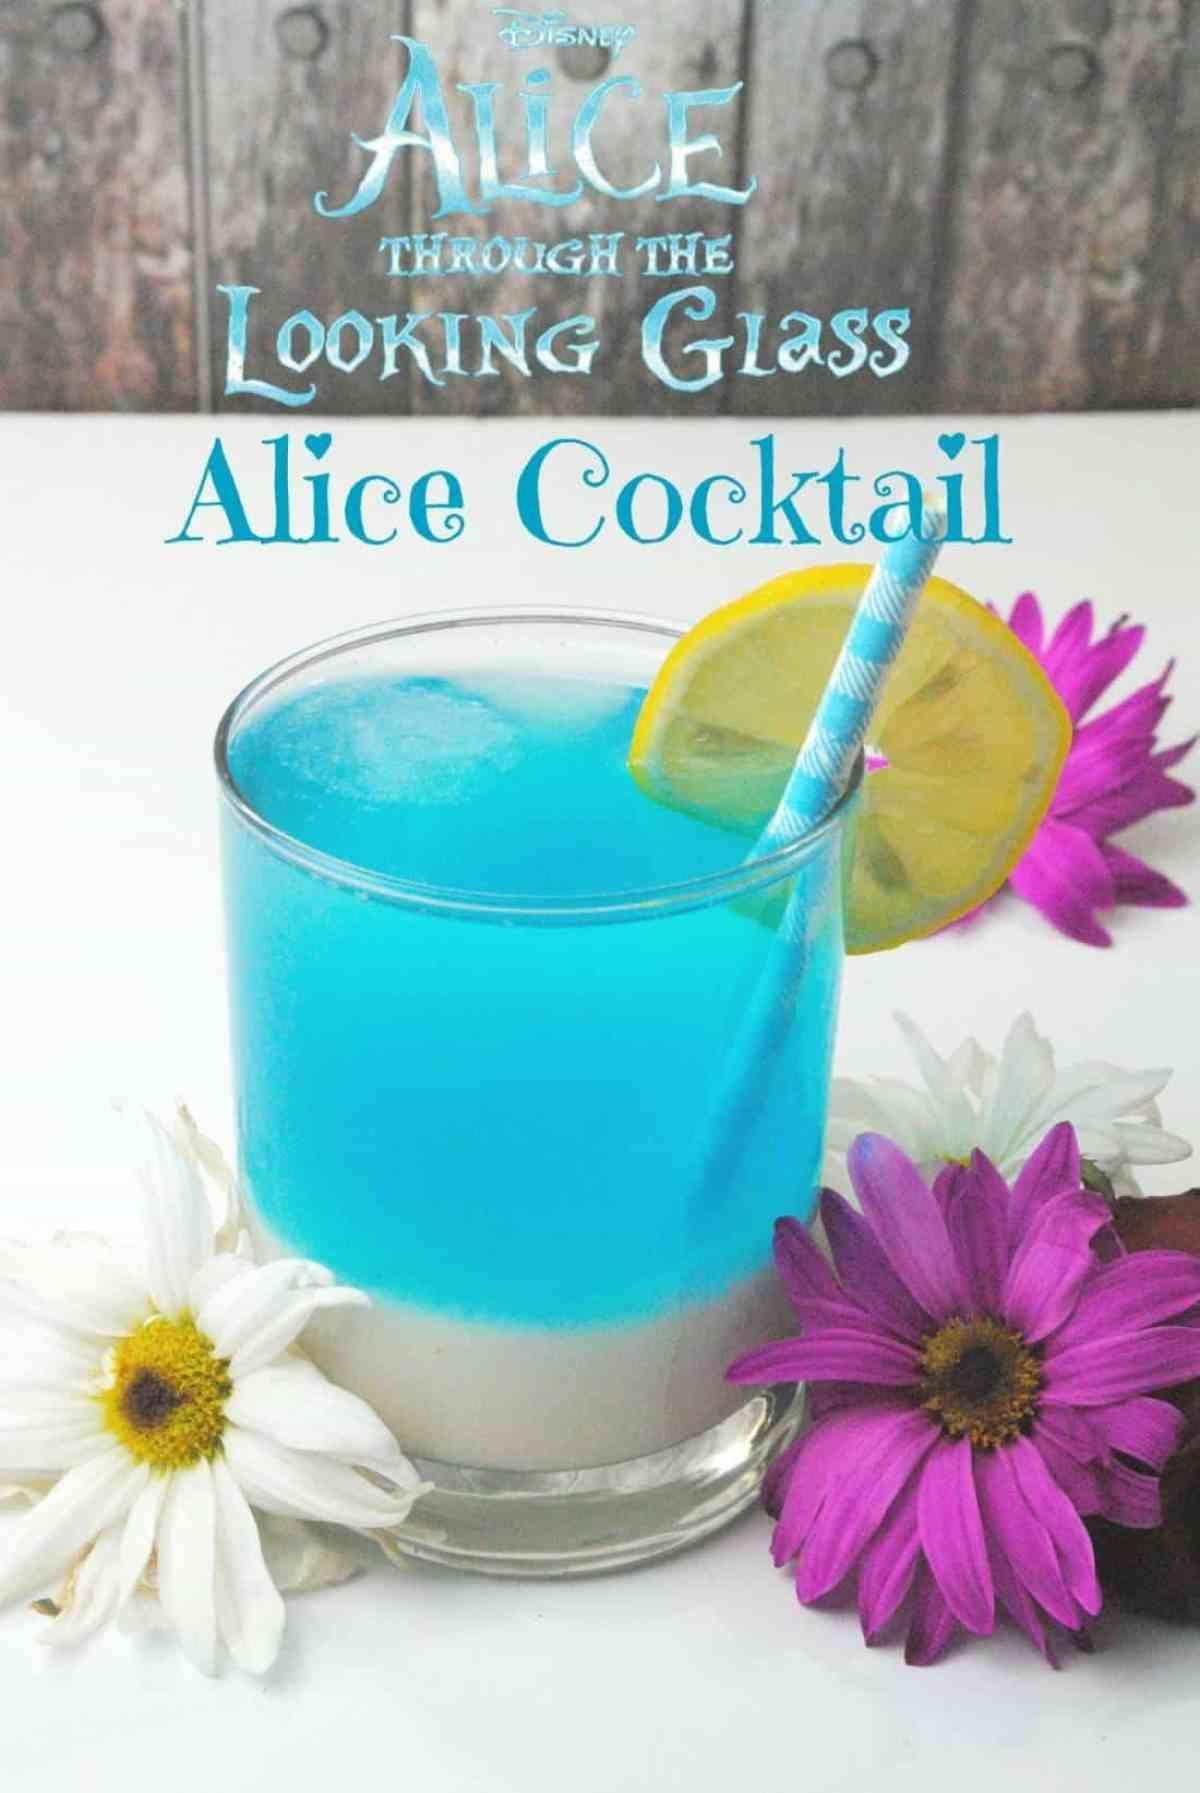 Alice cocktail1